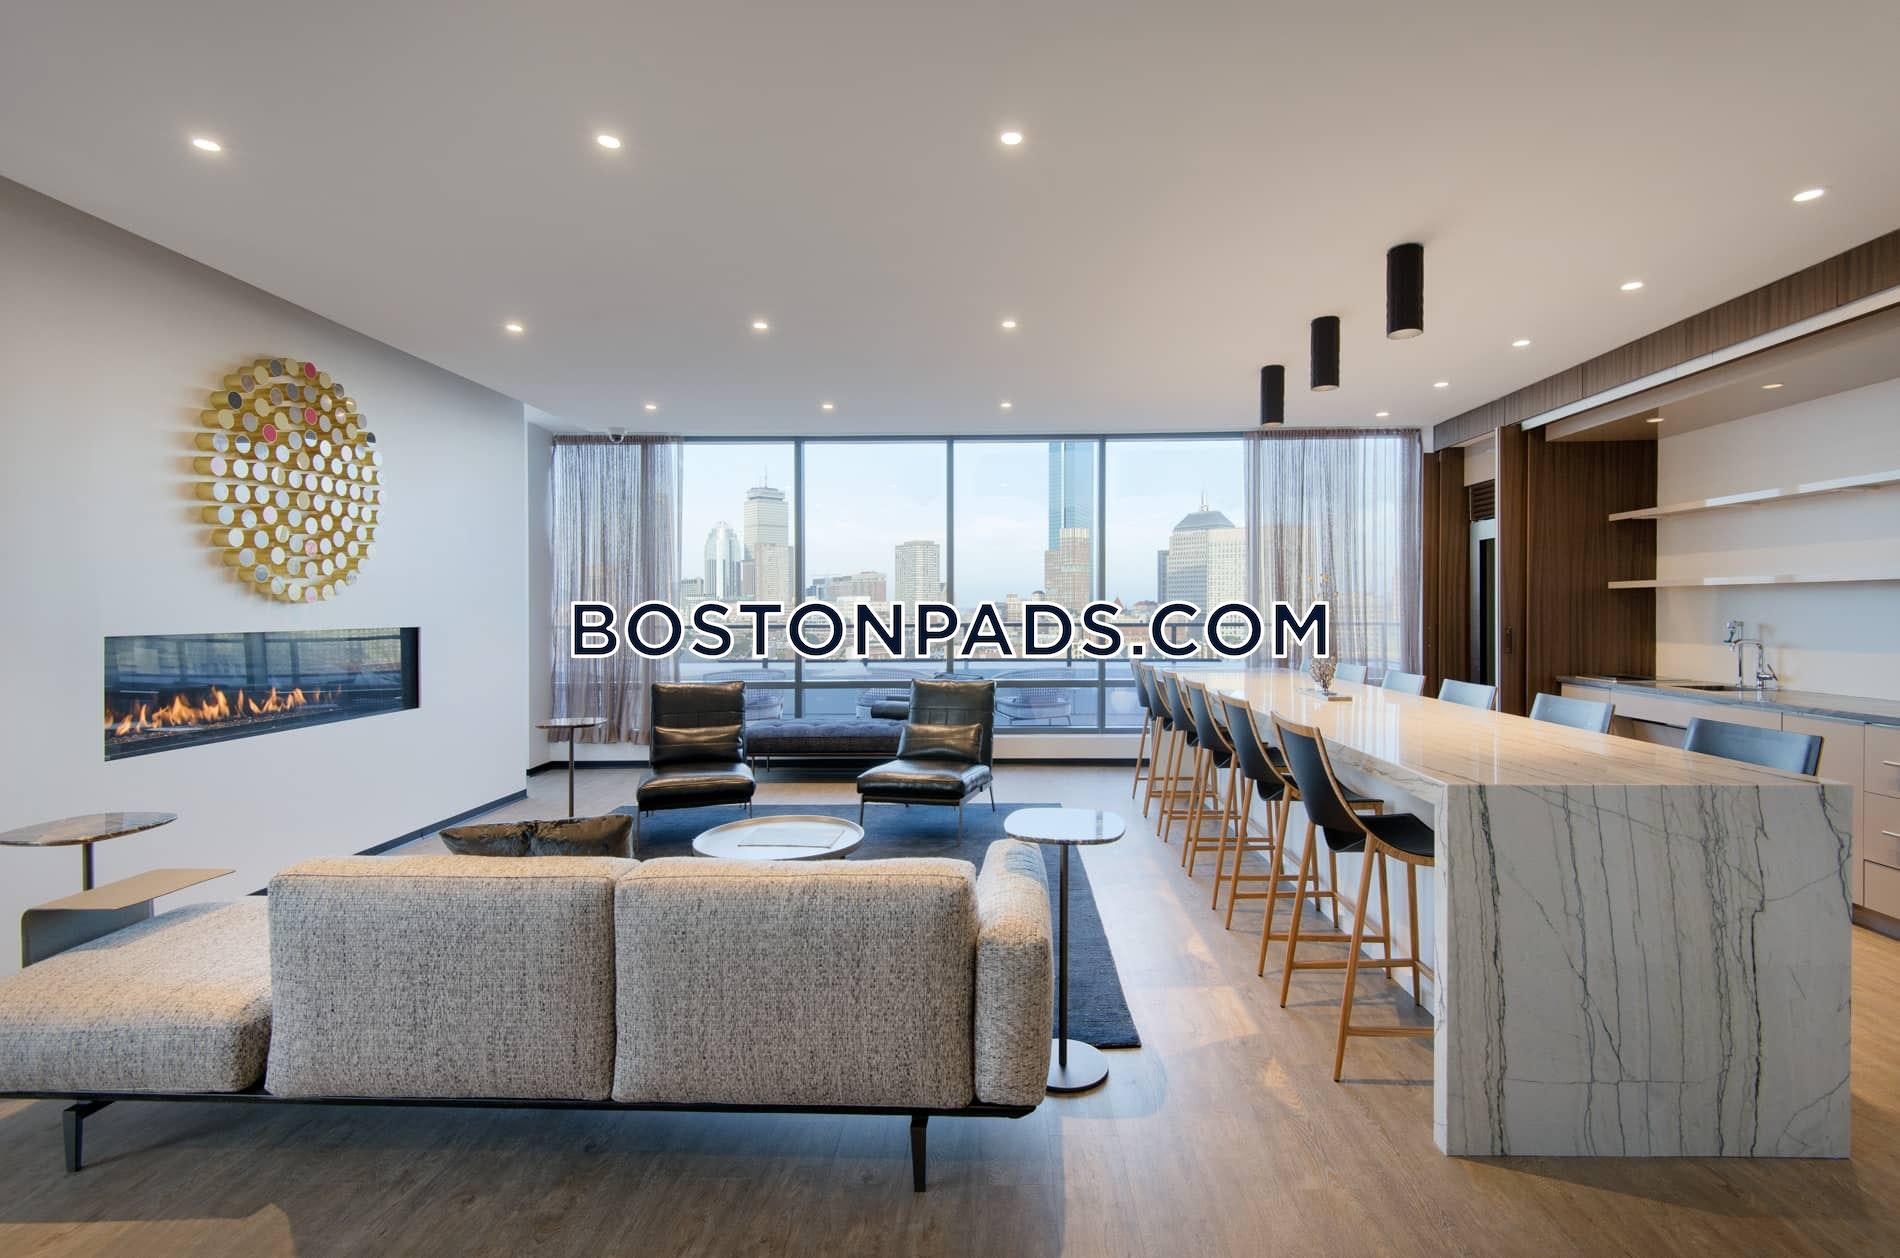 South End Apartments Downtown Apartment For Rent Studio 1 Bath Boston 2 904